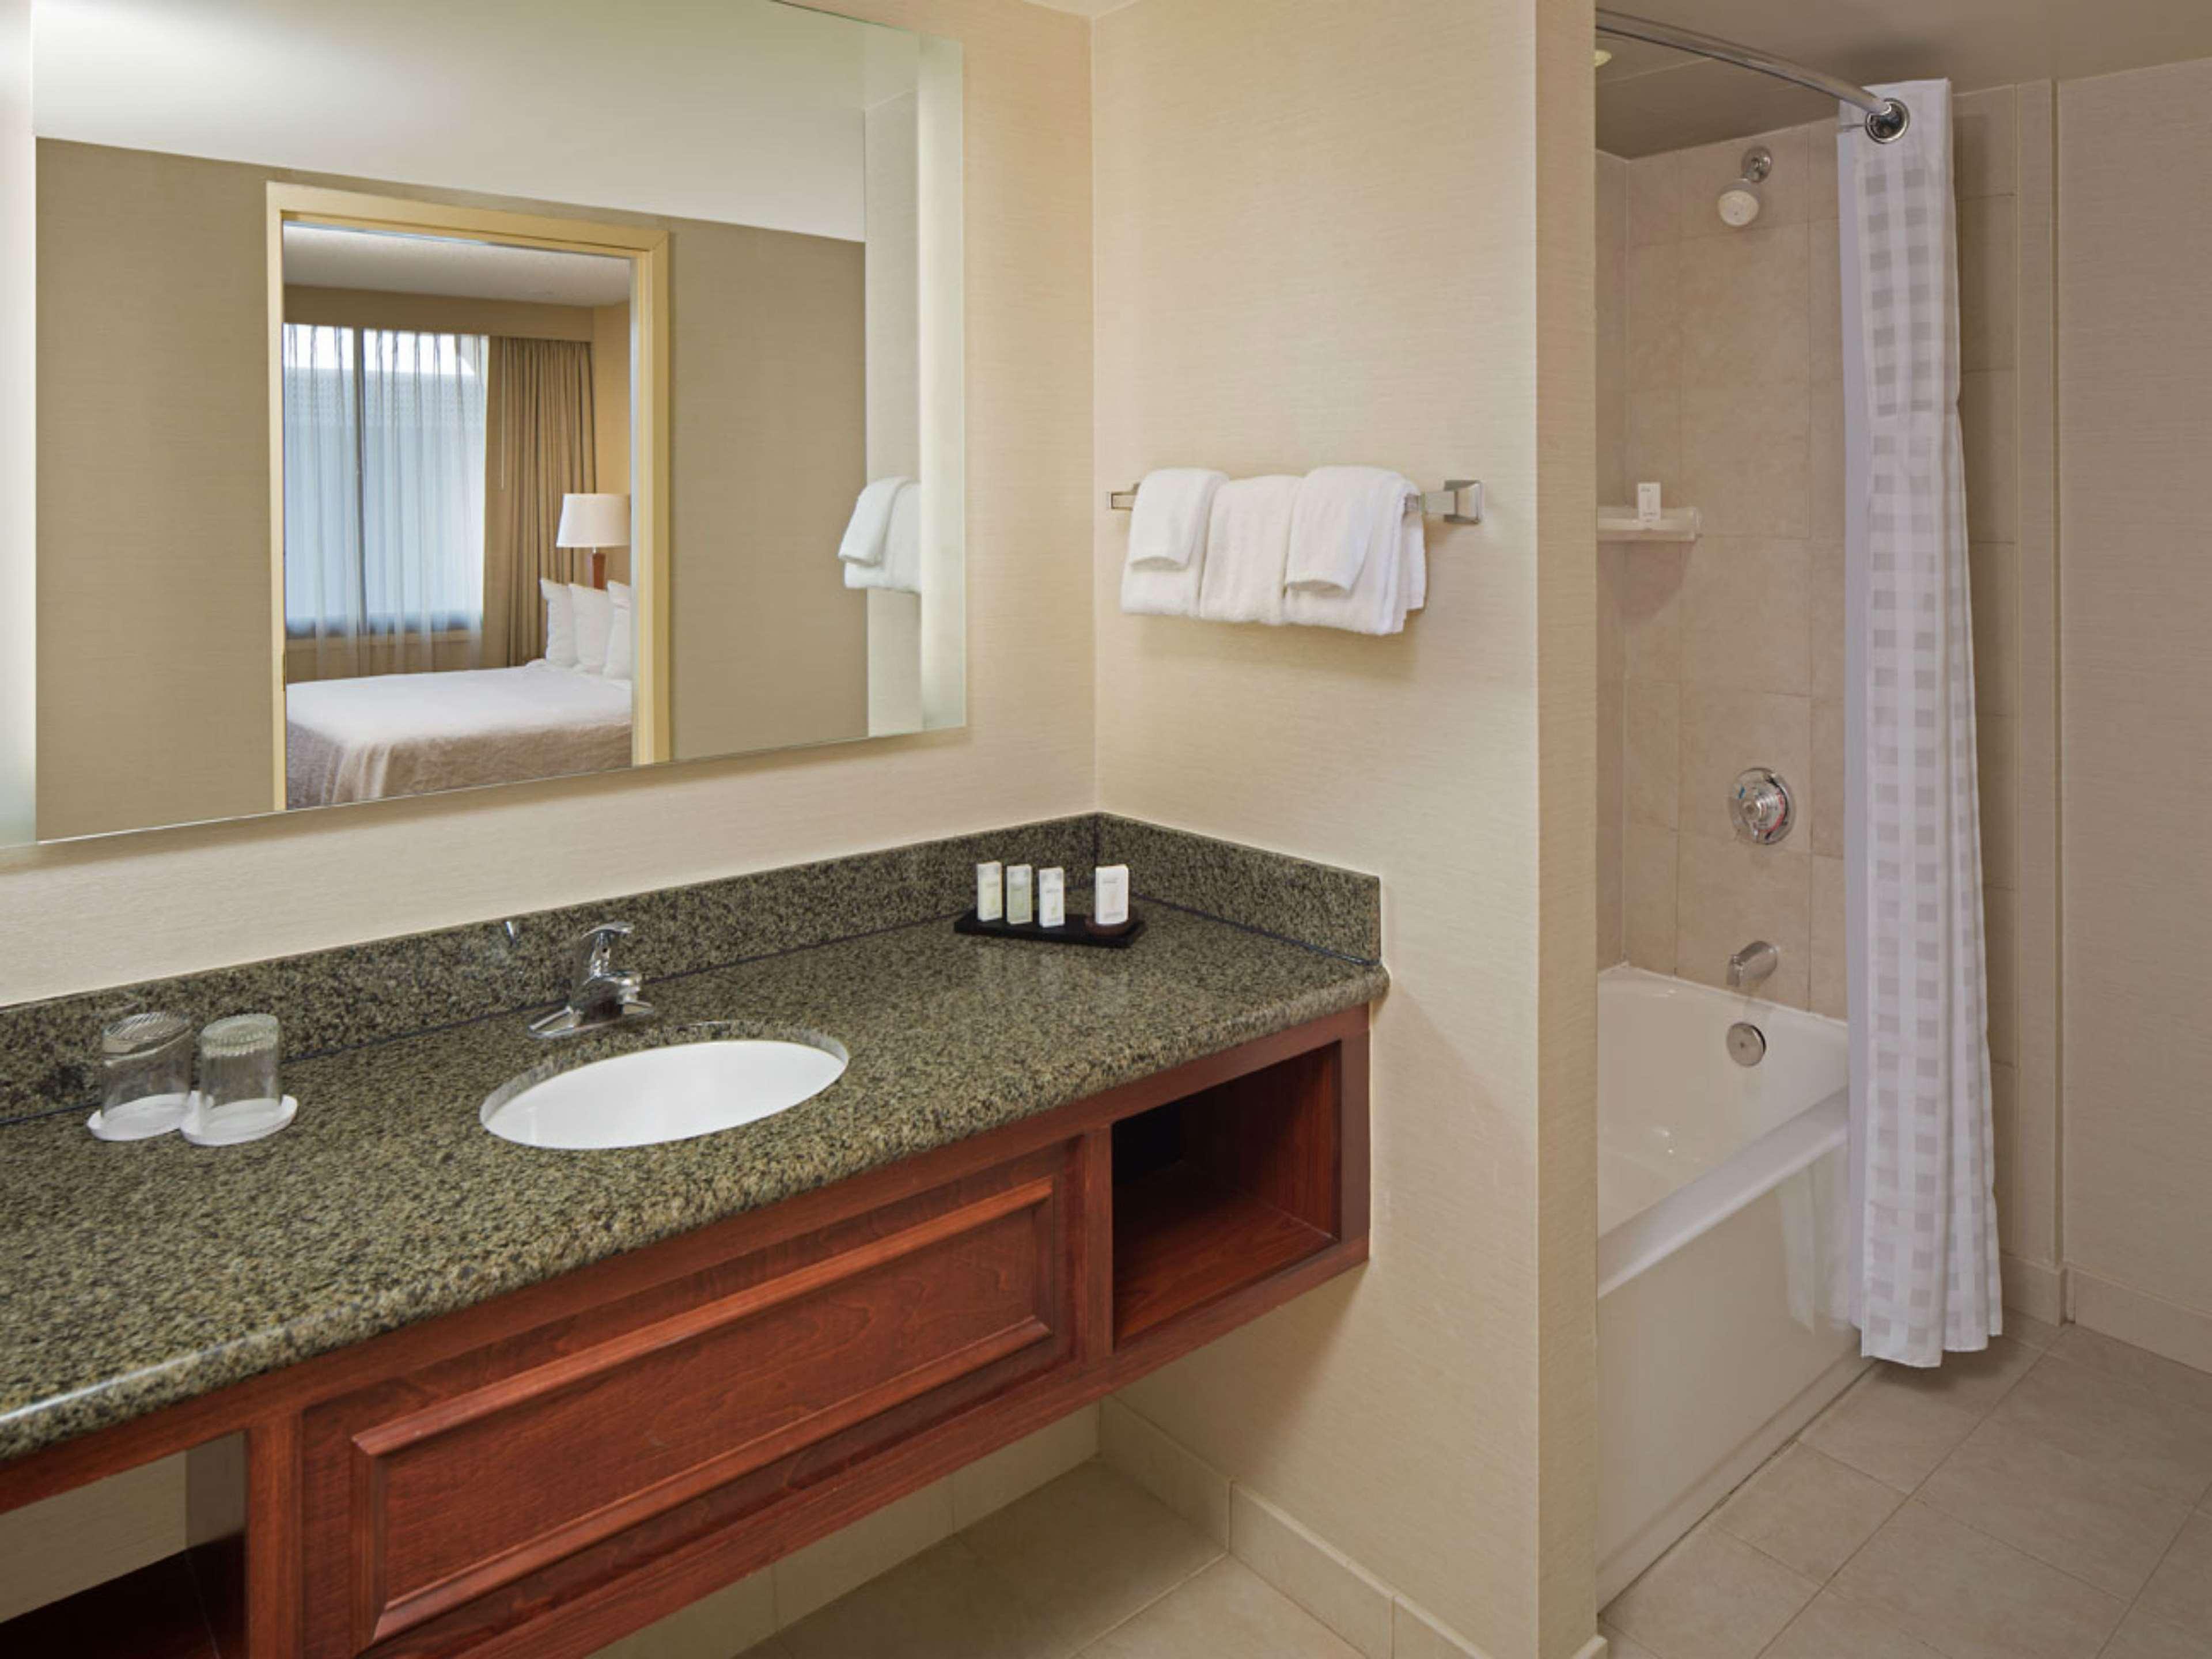 Embassy Suites by Hilton Winston Salem image 11